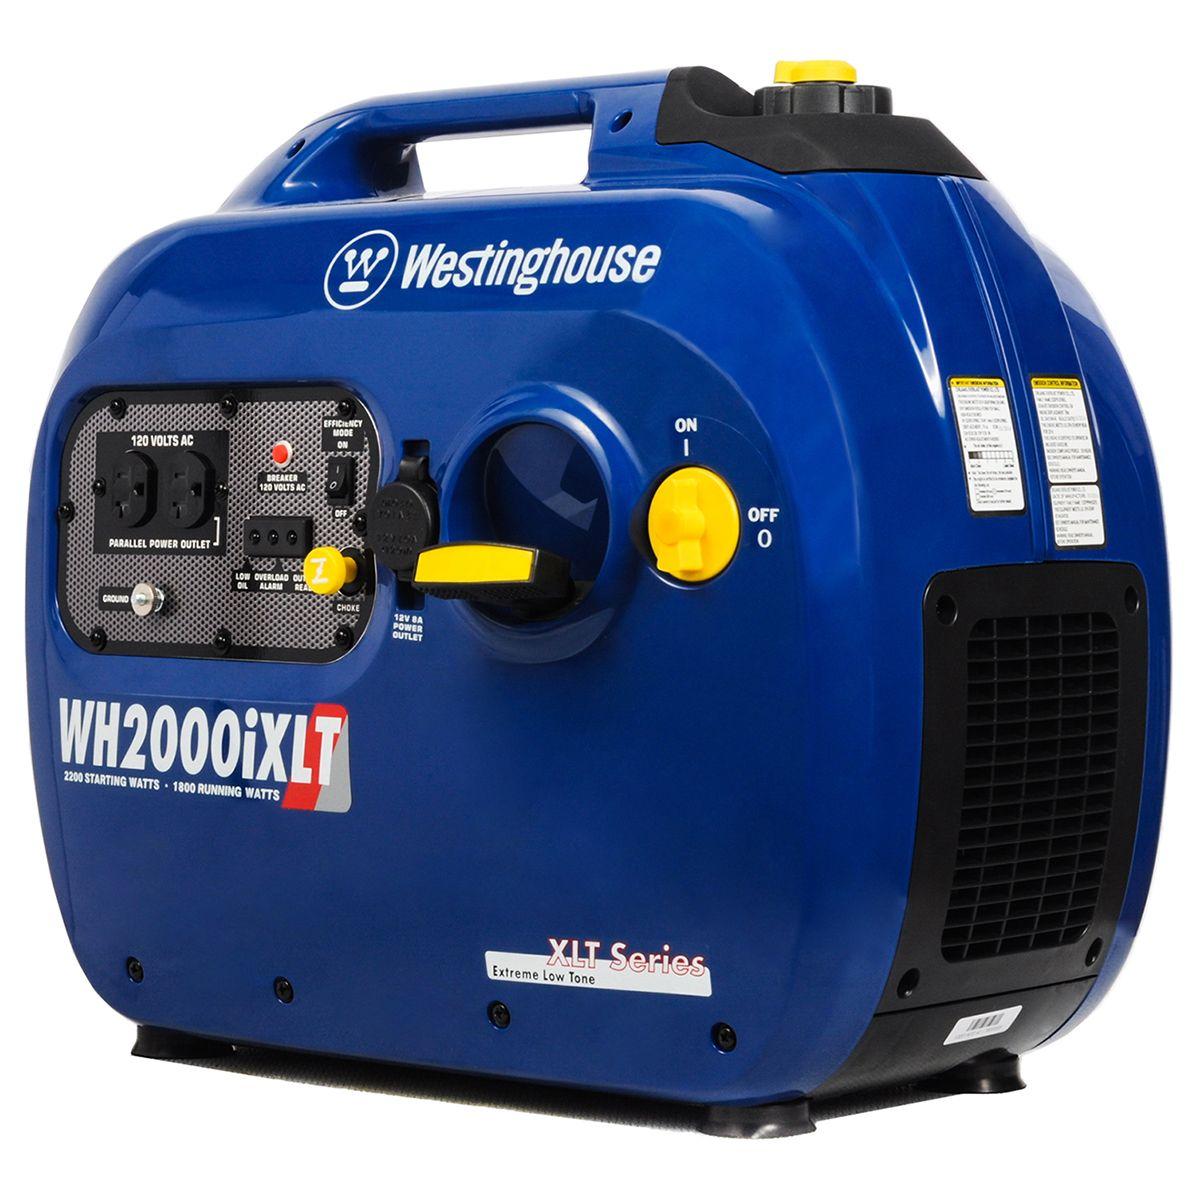 CR10000ACH 10,000 BTU Portable Air Conditioner and Heater